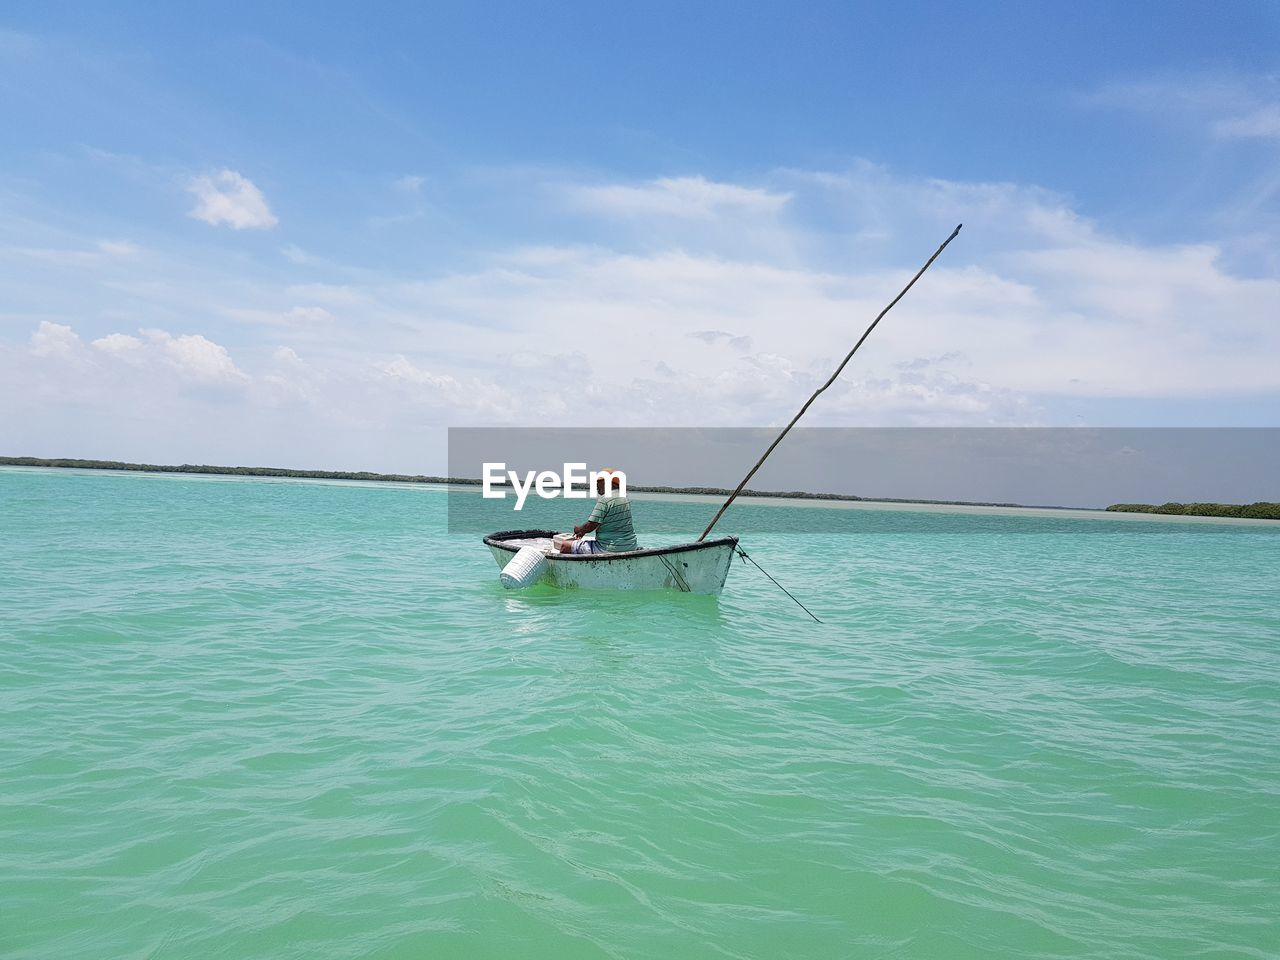 Man On Boat In Sea Against Sky